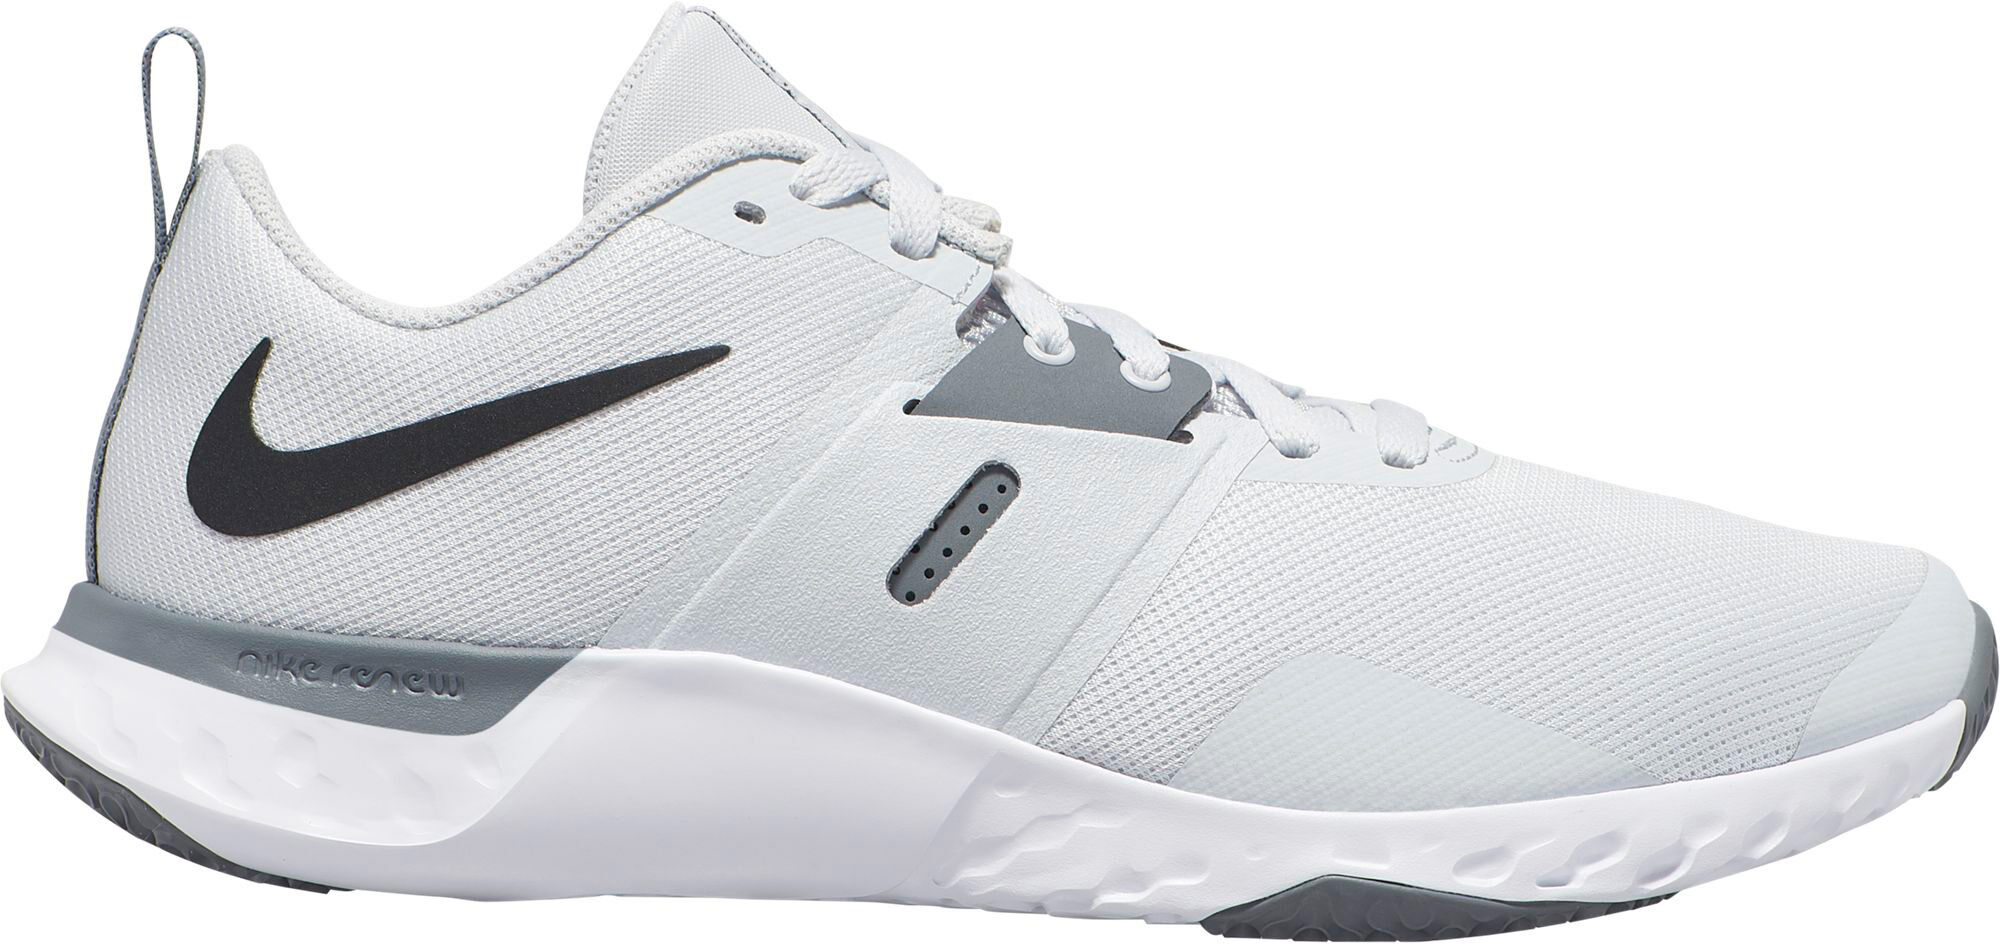 Heren ADIDAS Fitness schoenen Training Intersport